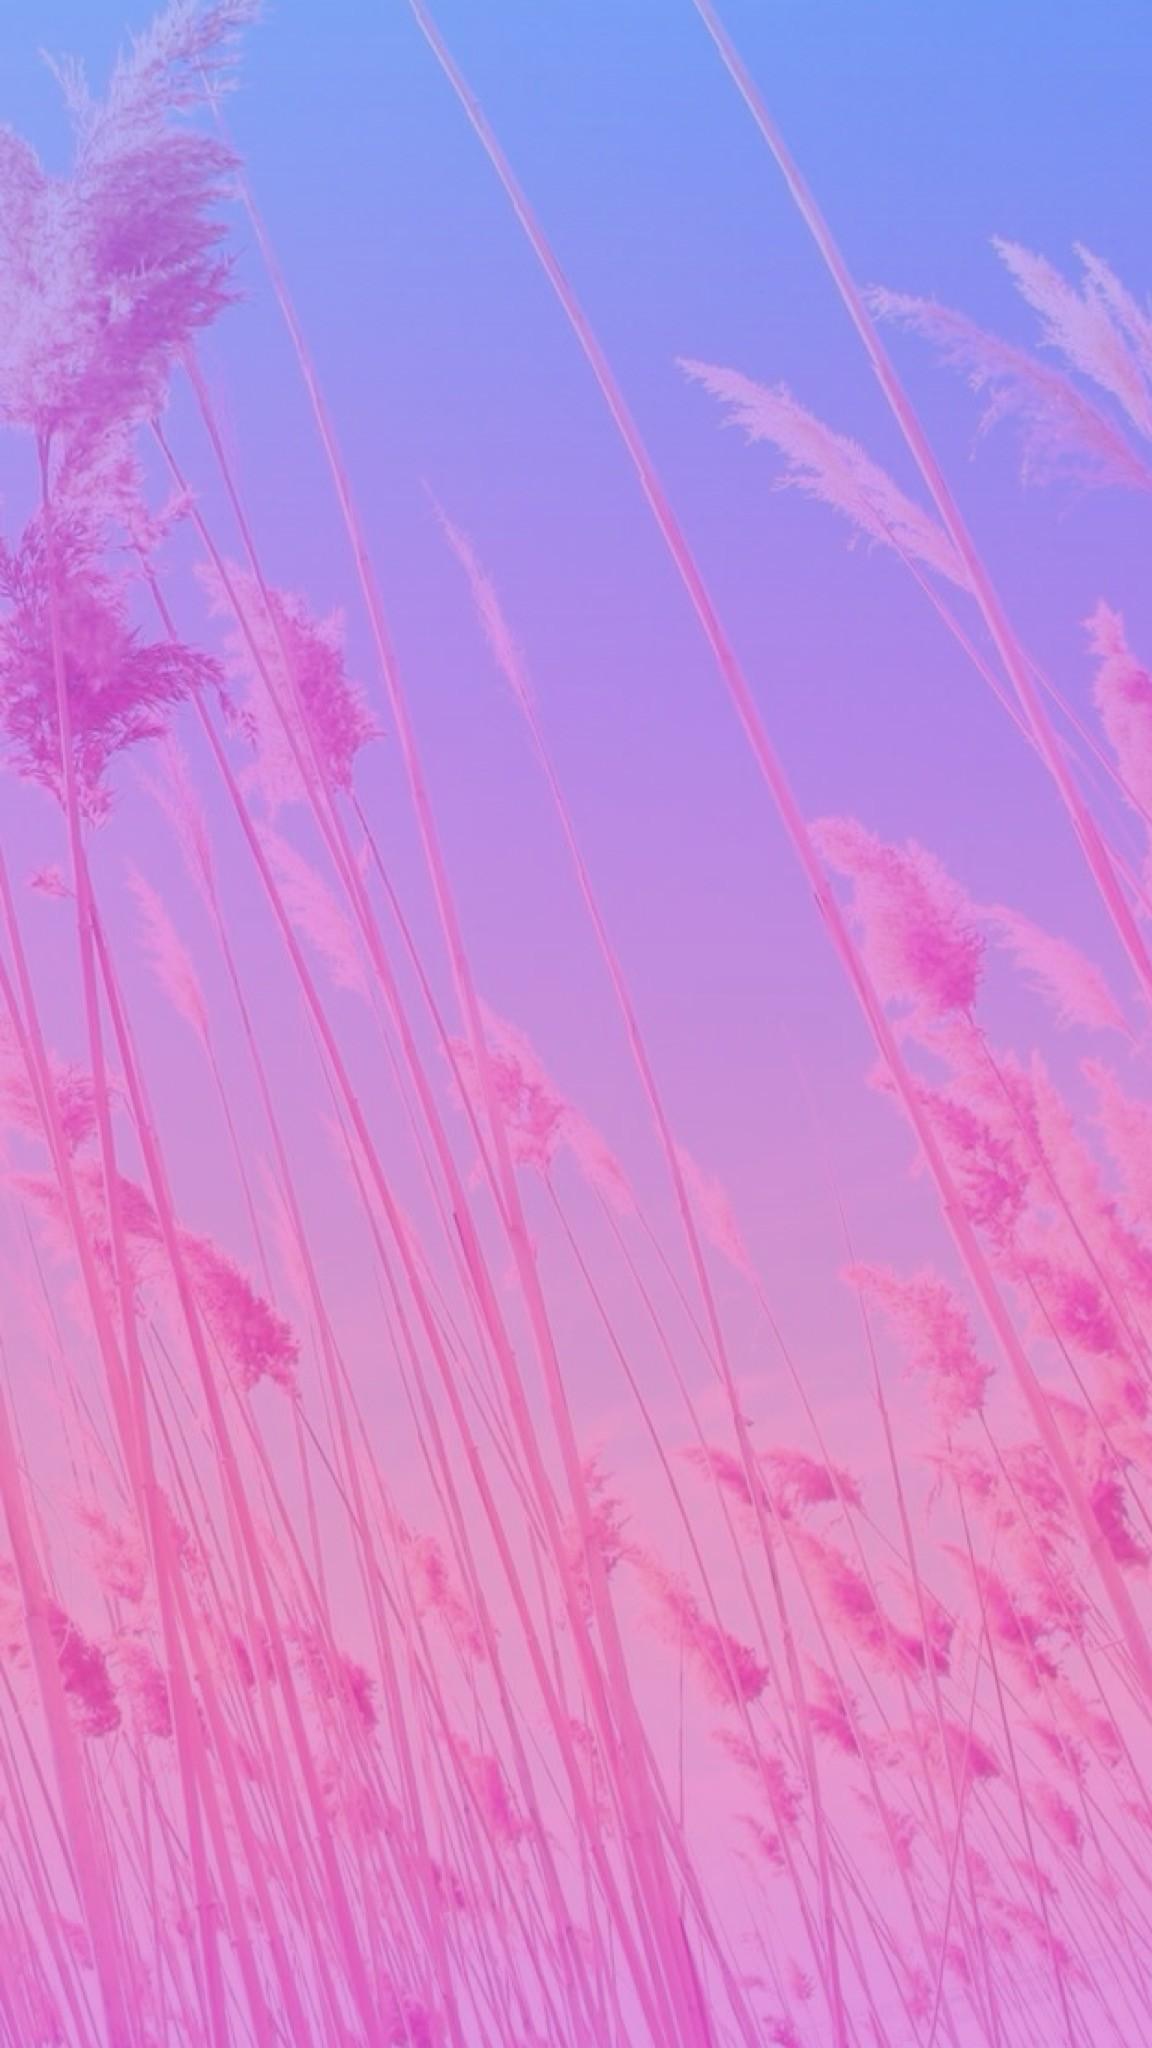 Pink Phone Wallpaper 64 images